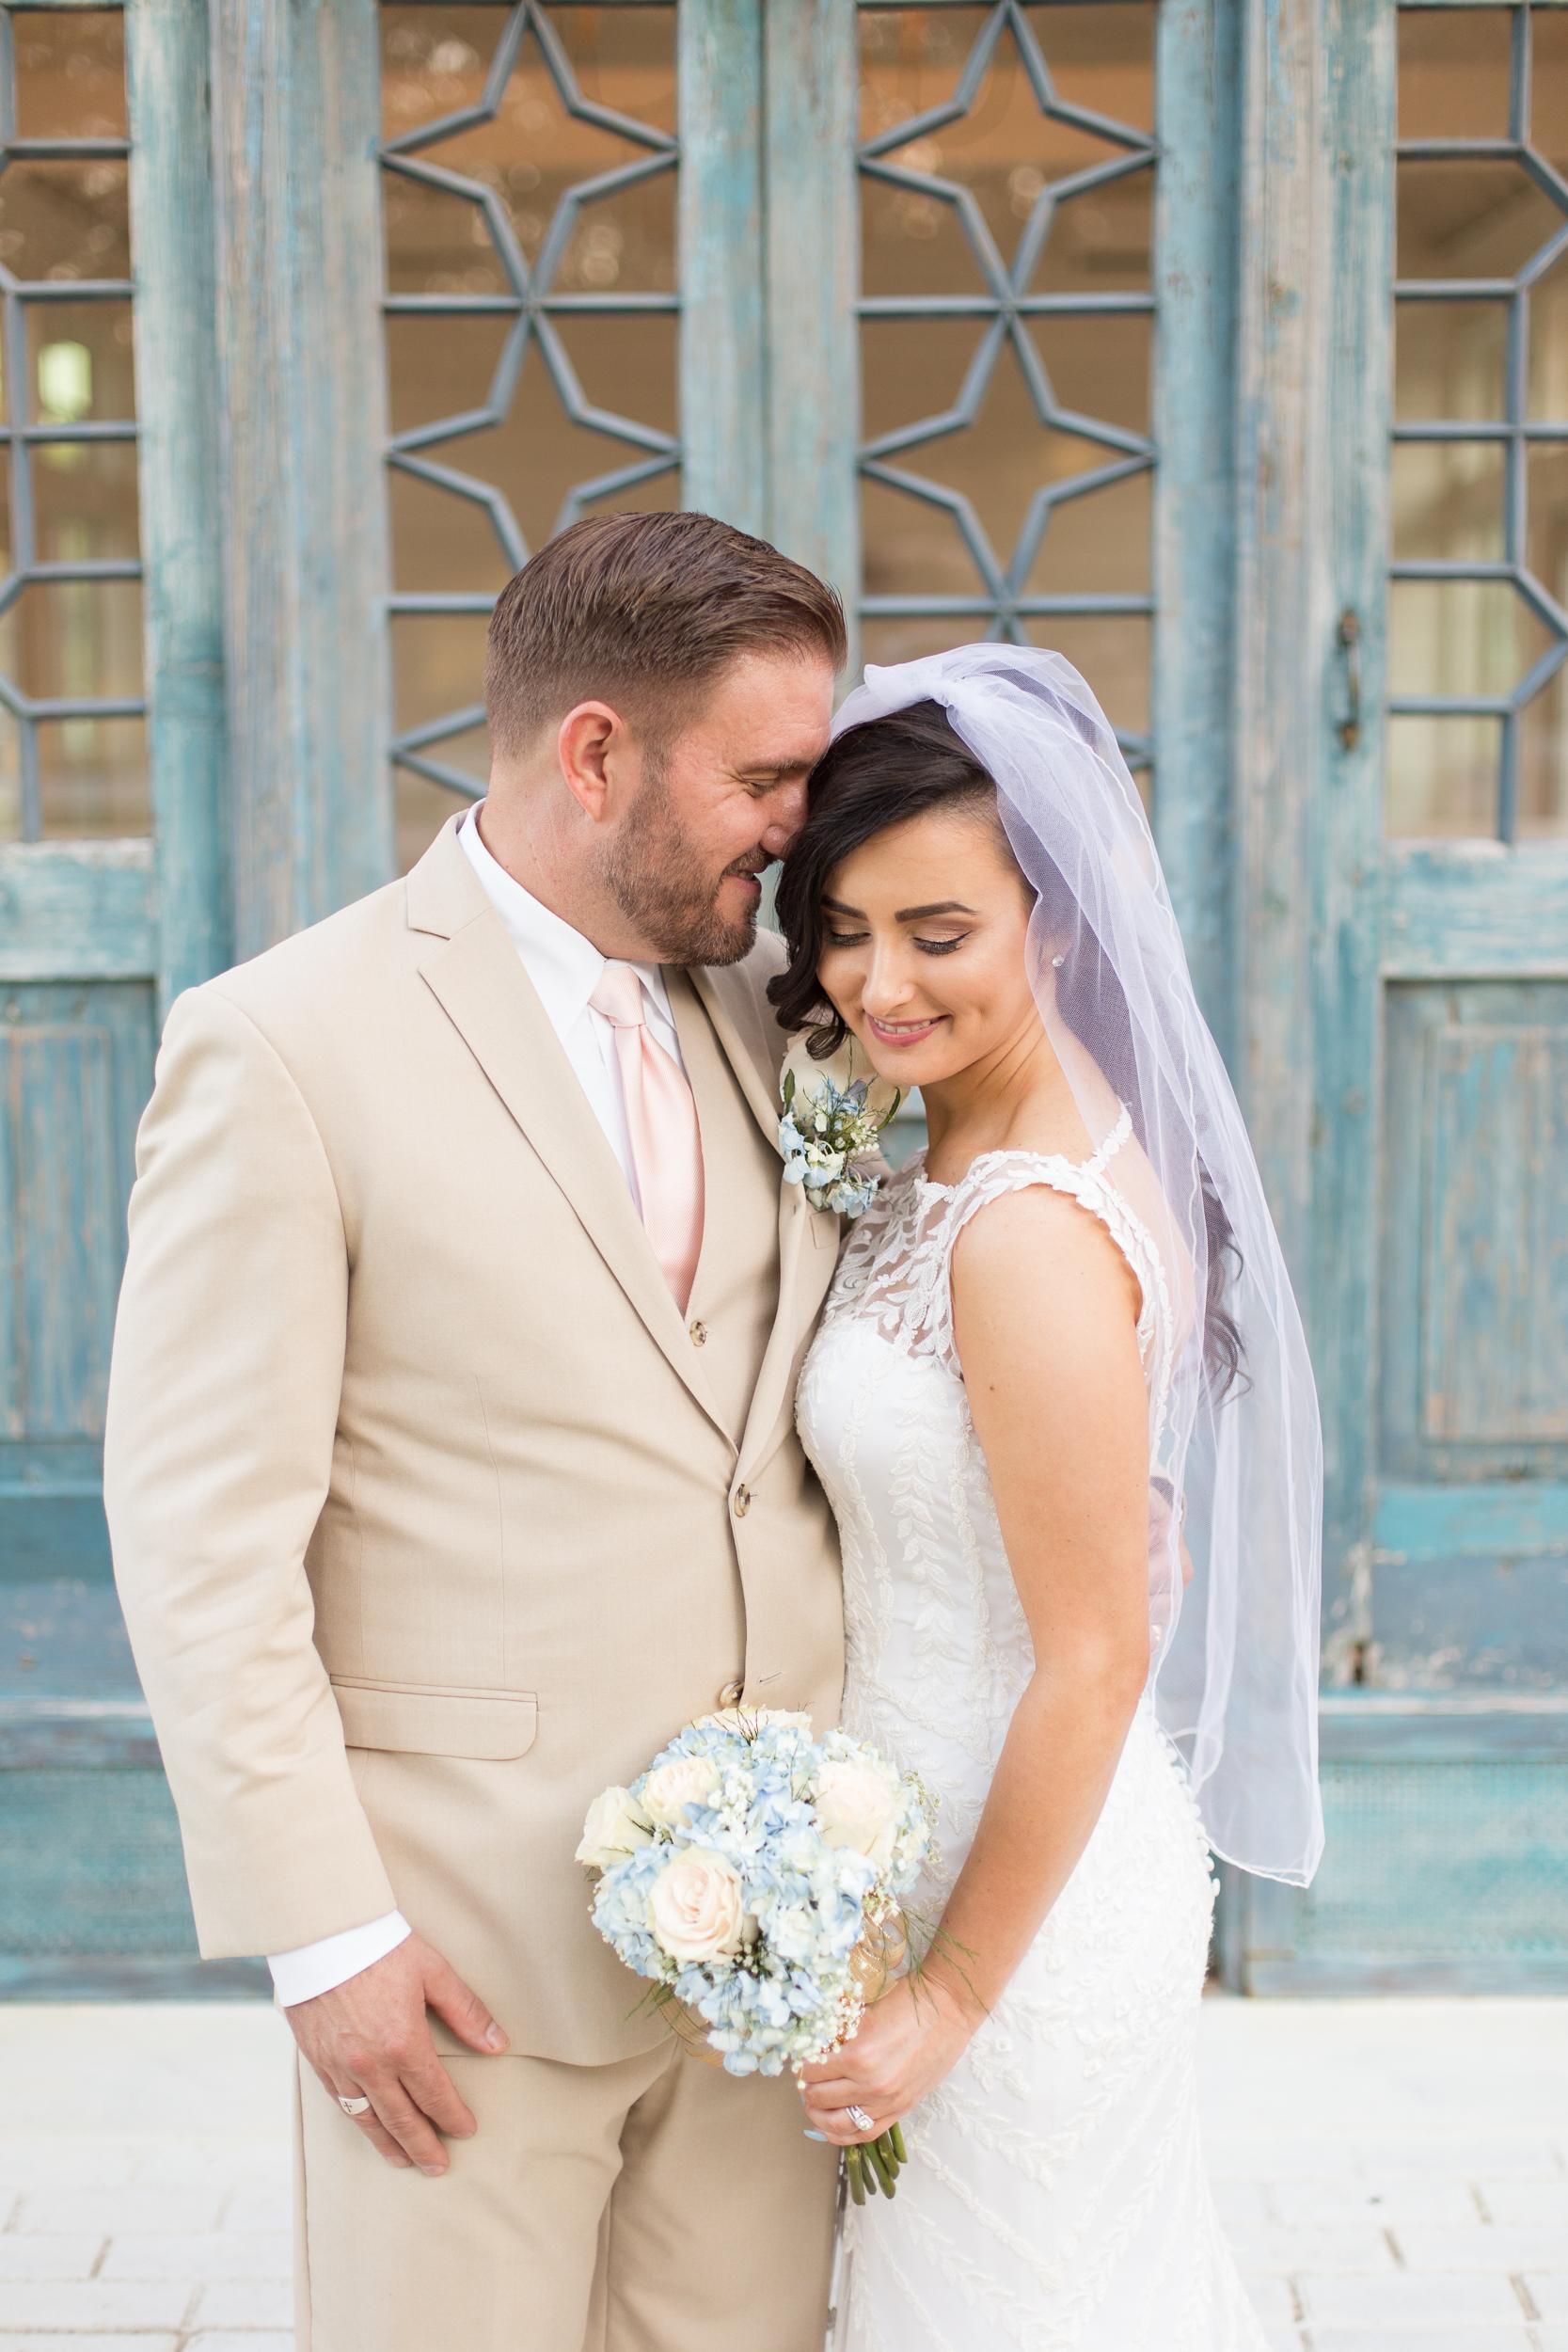 Zihlman-East TX Wedding_Kelsie Hendricks Photography_The Folmar Tyler Texas-118.jpg